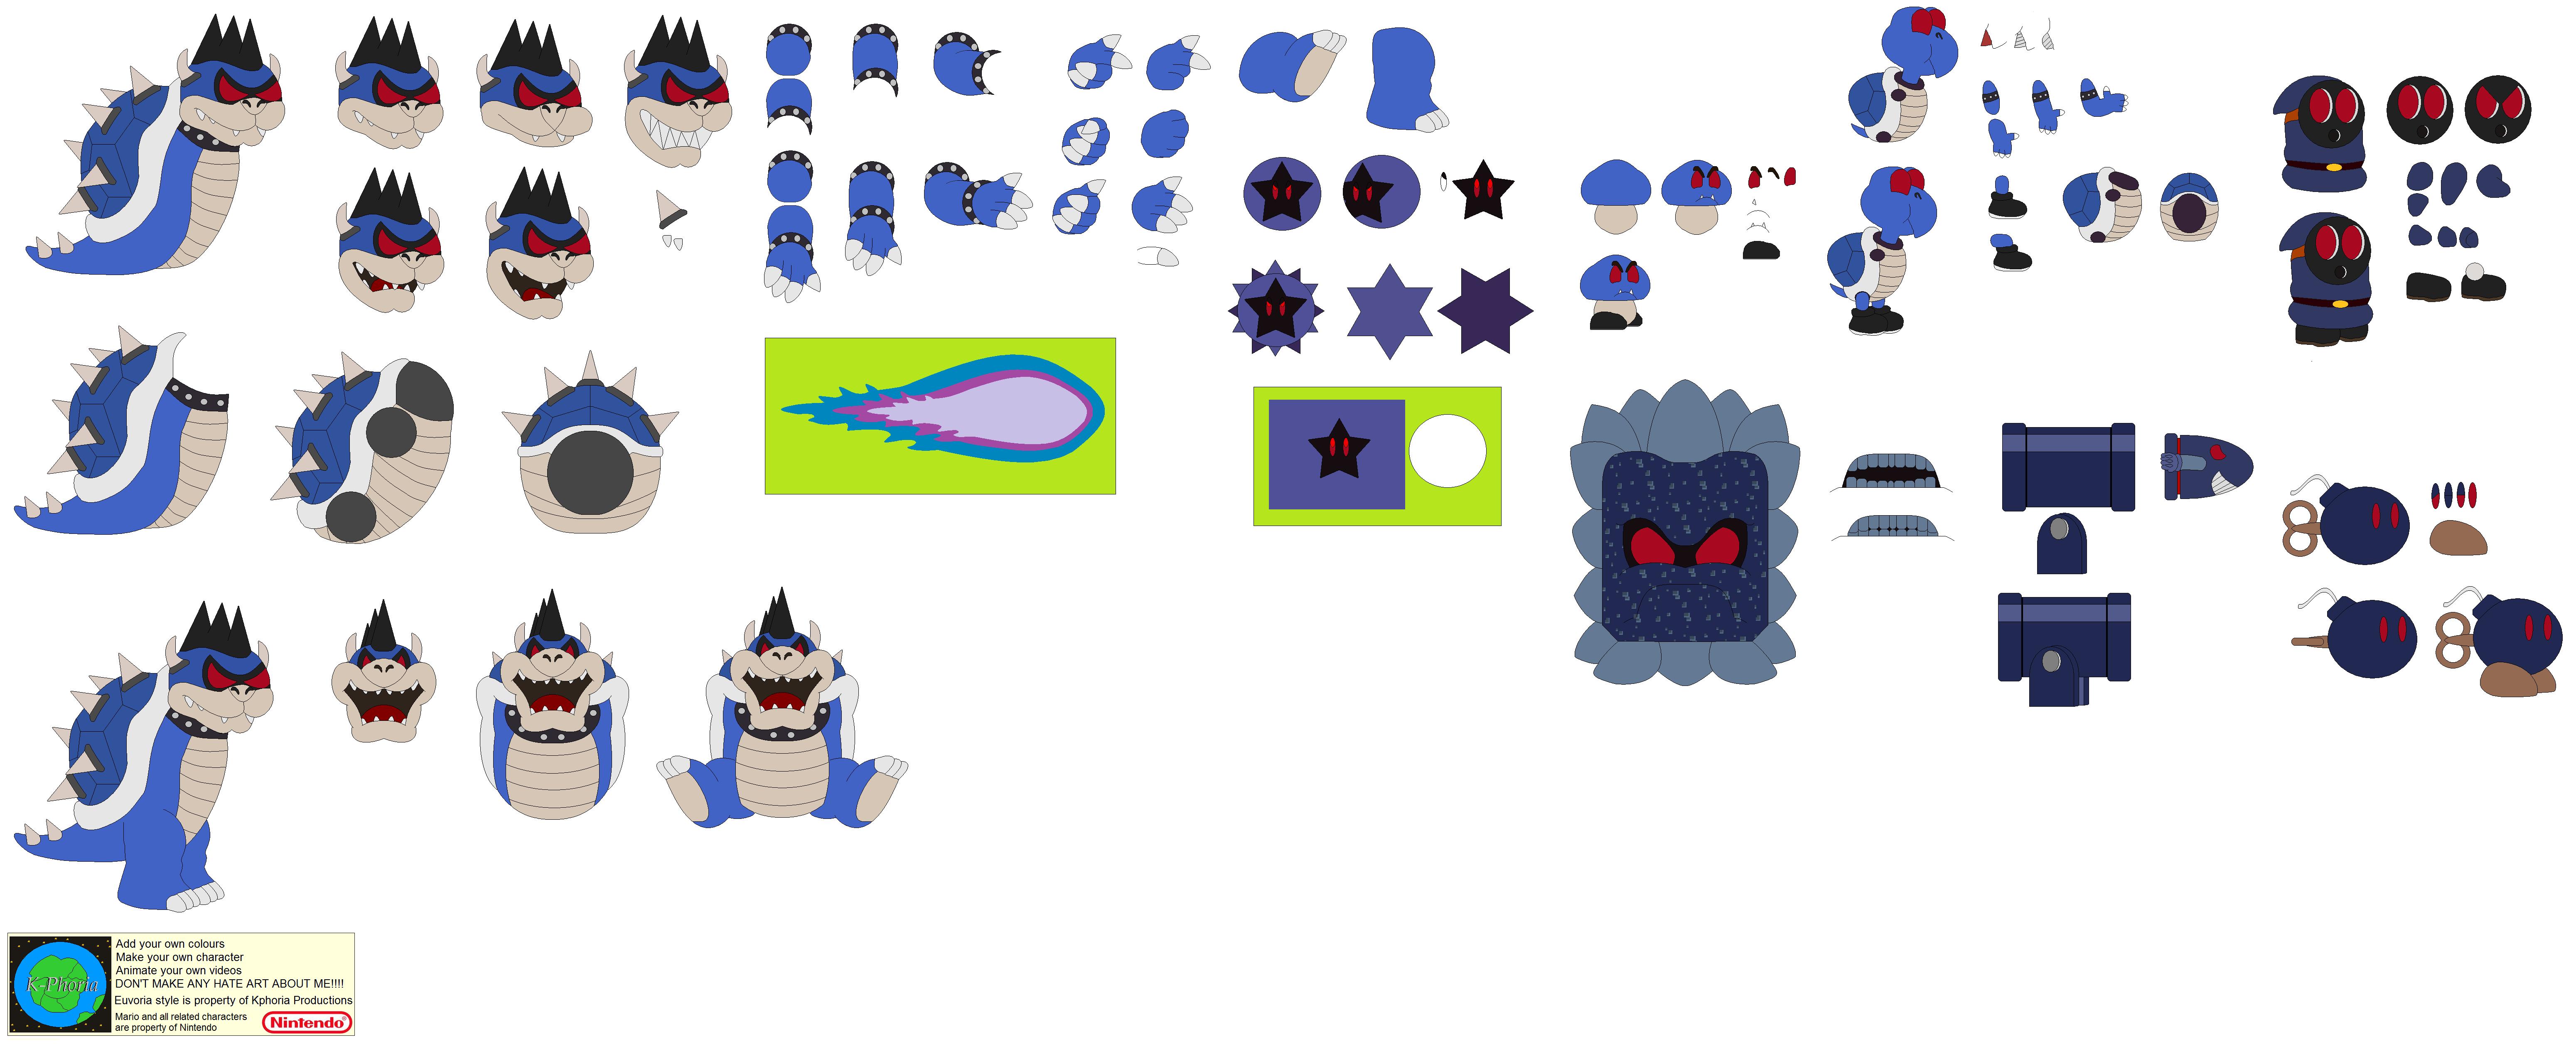 Character Builder Dark Star Bowser By Kphoria On Deviantart